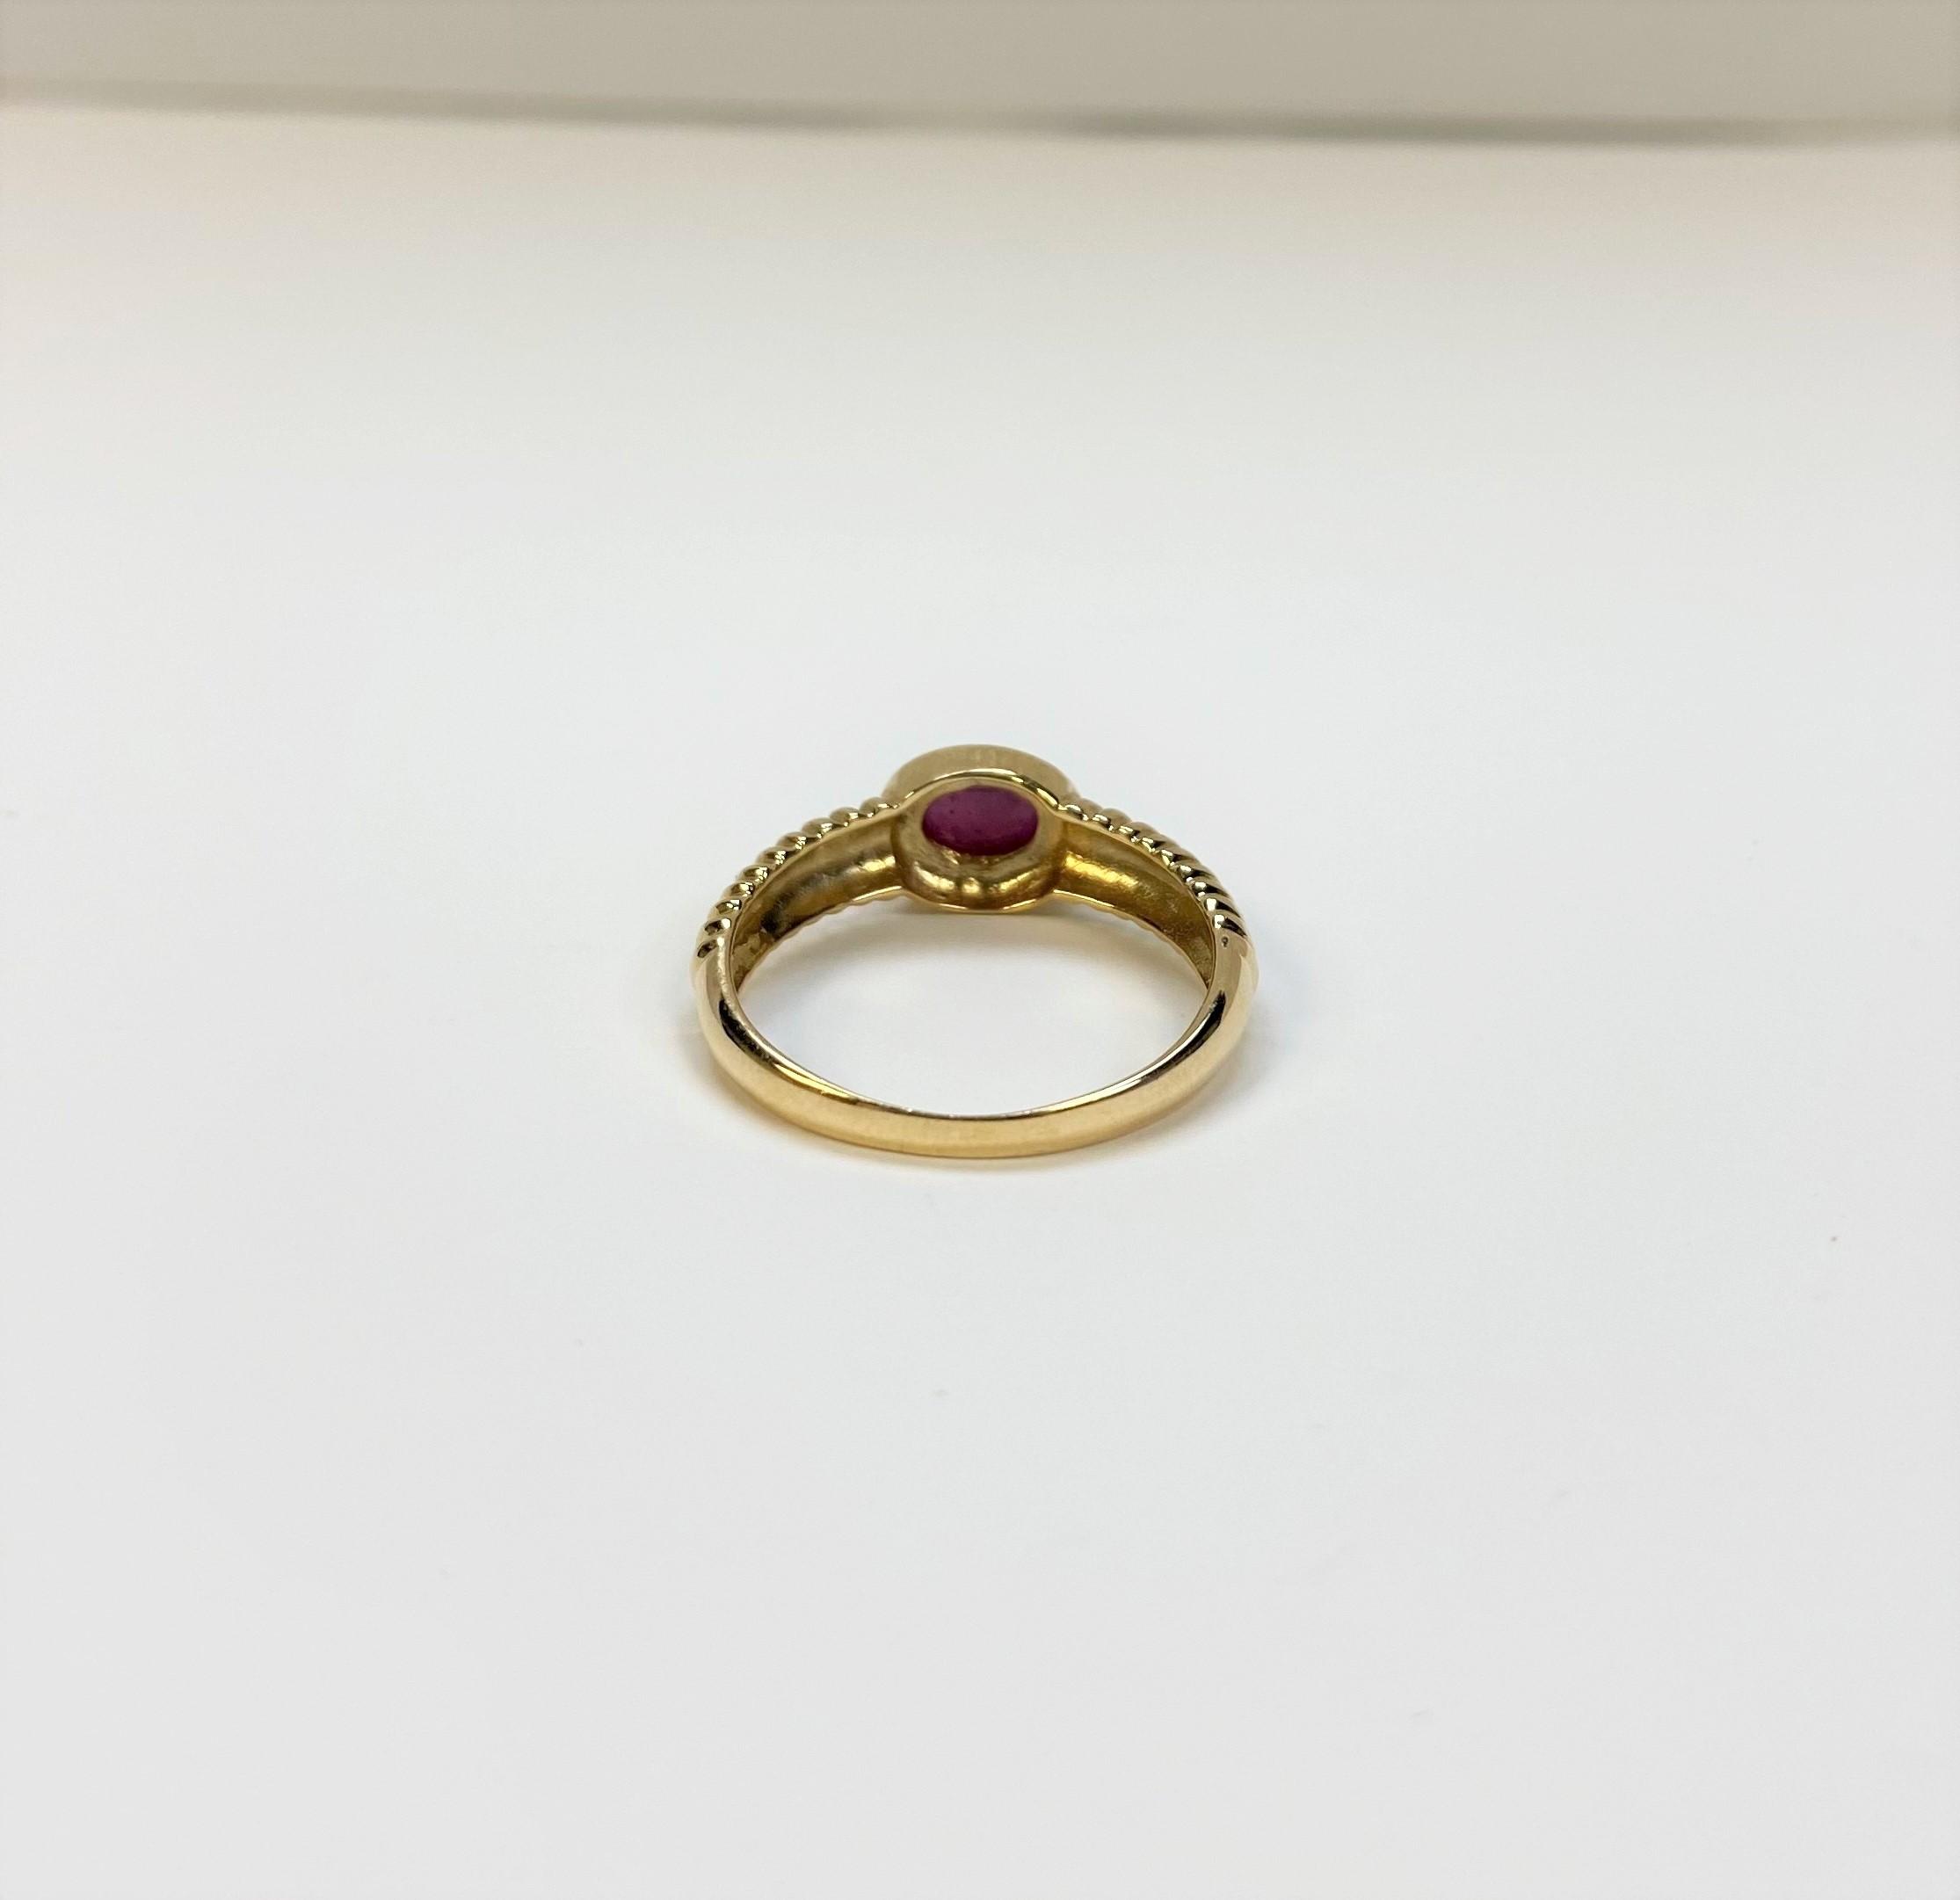 Quarter Carat Cabochon Ruby Ring